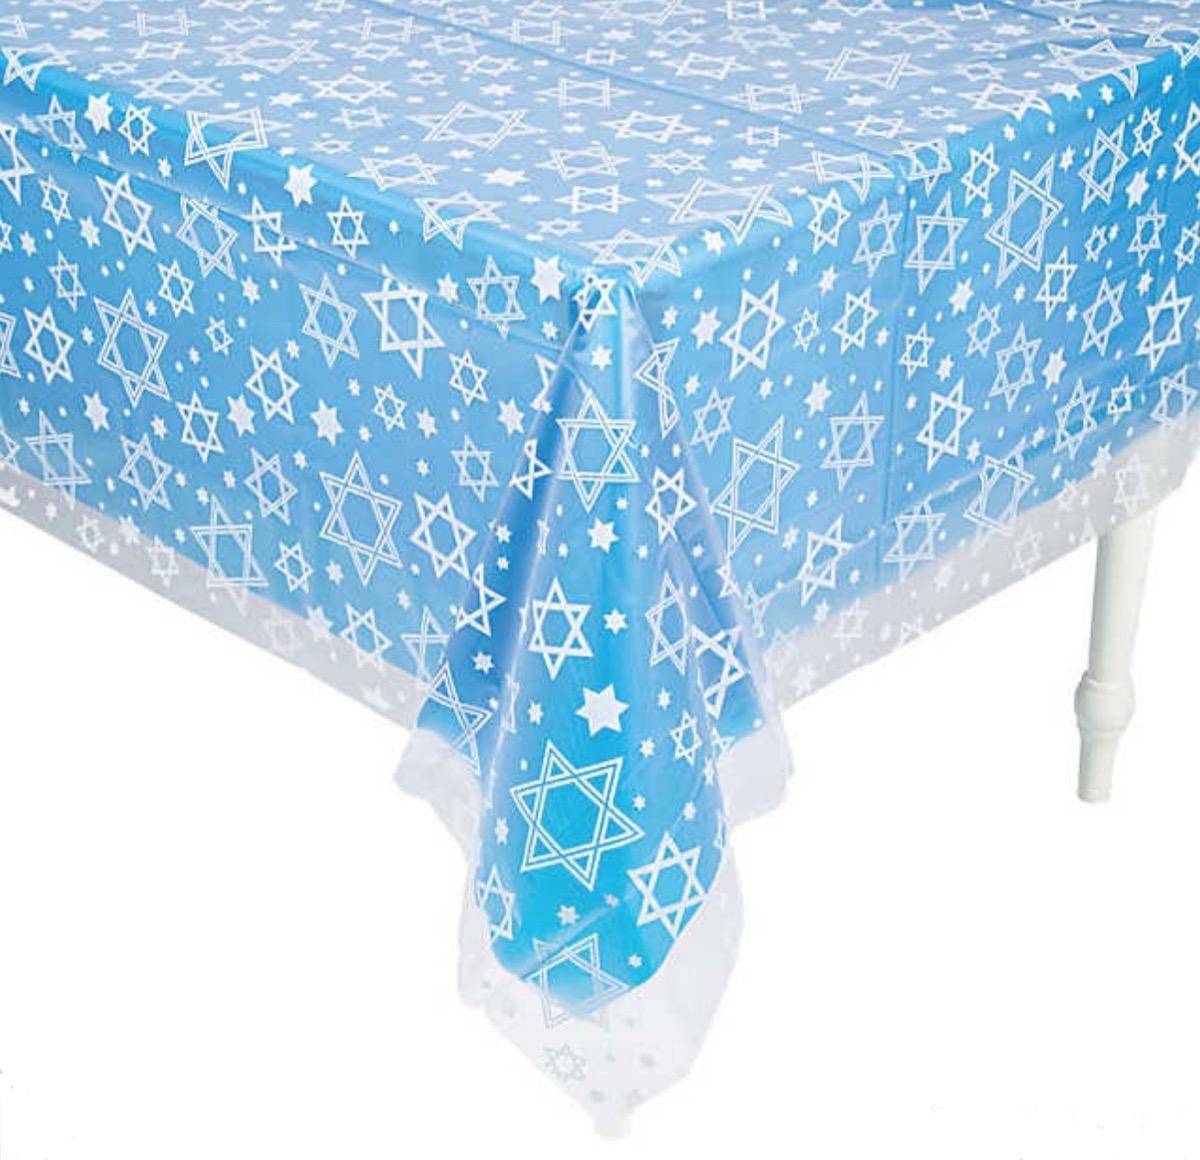 blue star of david tablecloth, hanukkah decorations